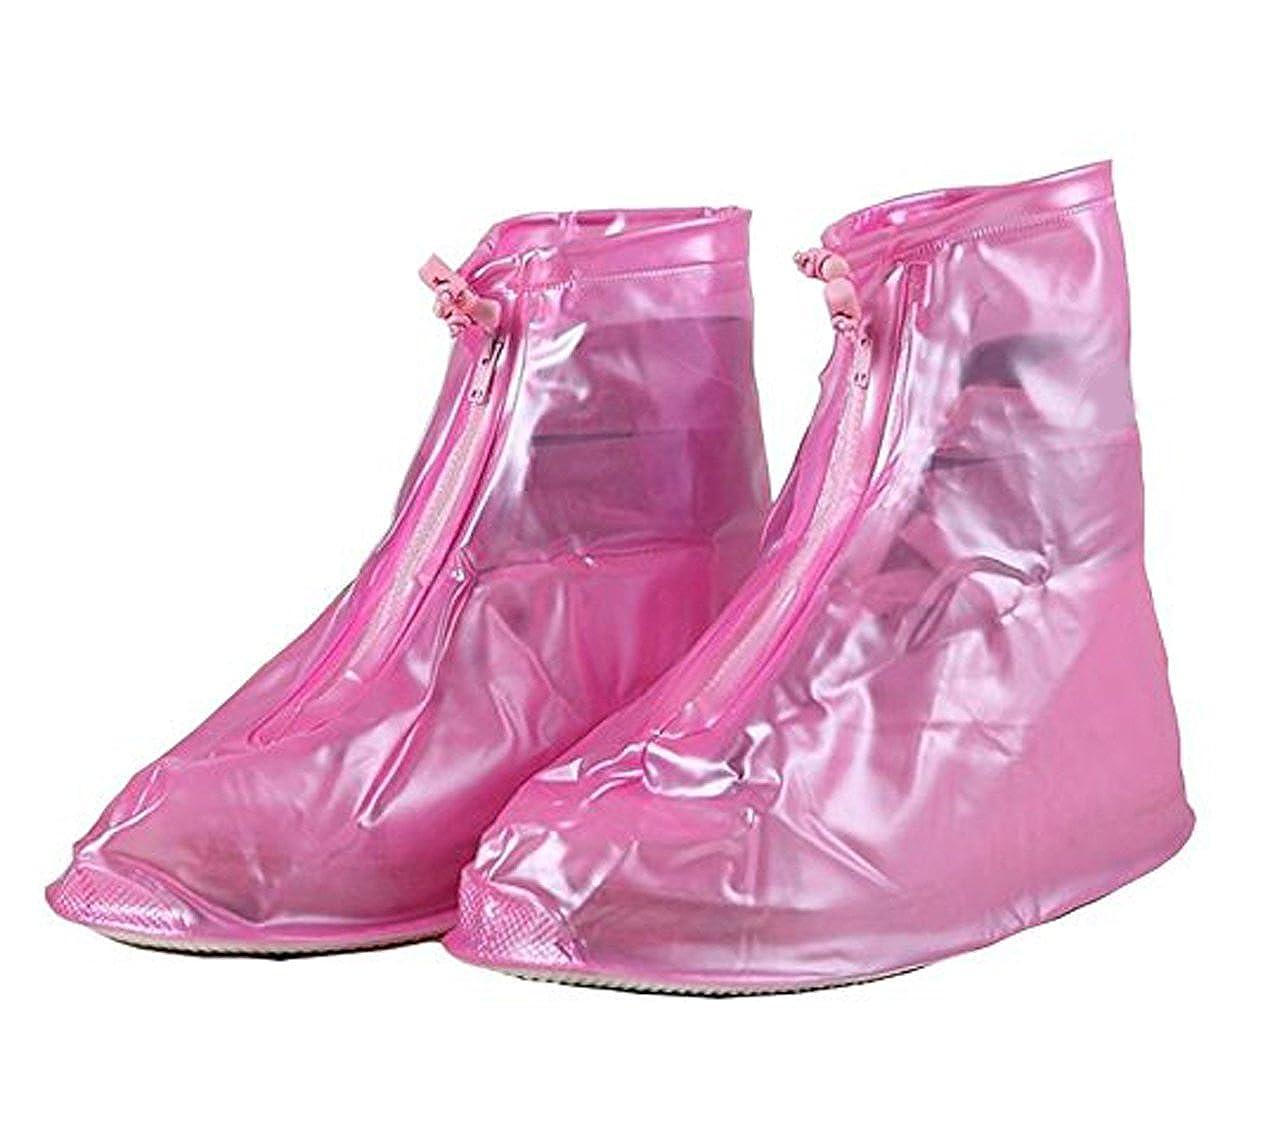 VICUNA POLO Rain Shoes Transparent Waterproof Snow Men Women Rain Boots for Kids/Adult Shoes